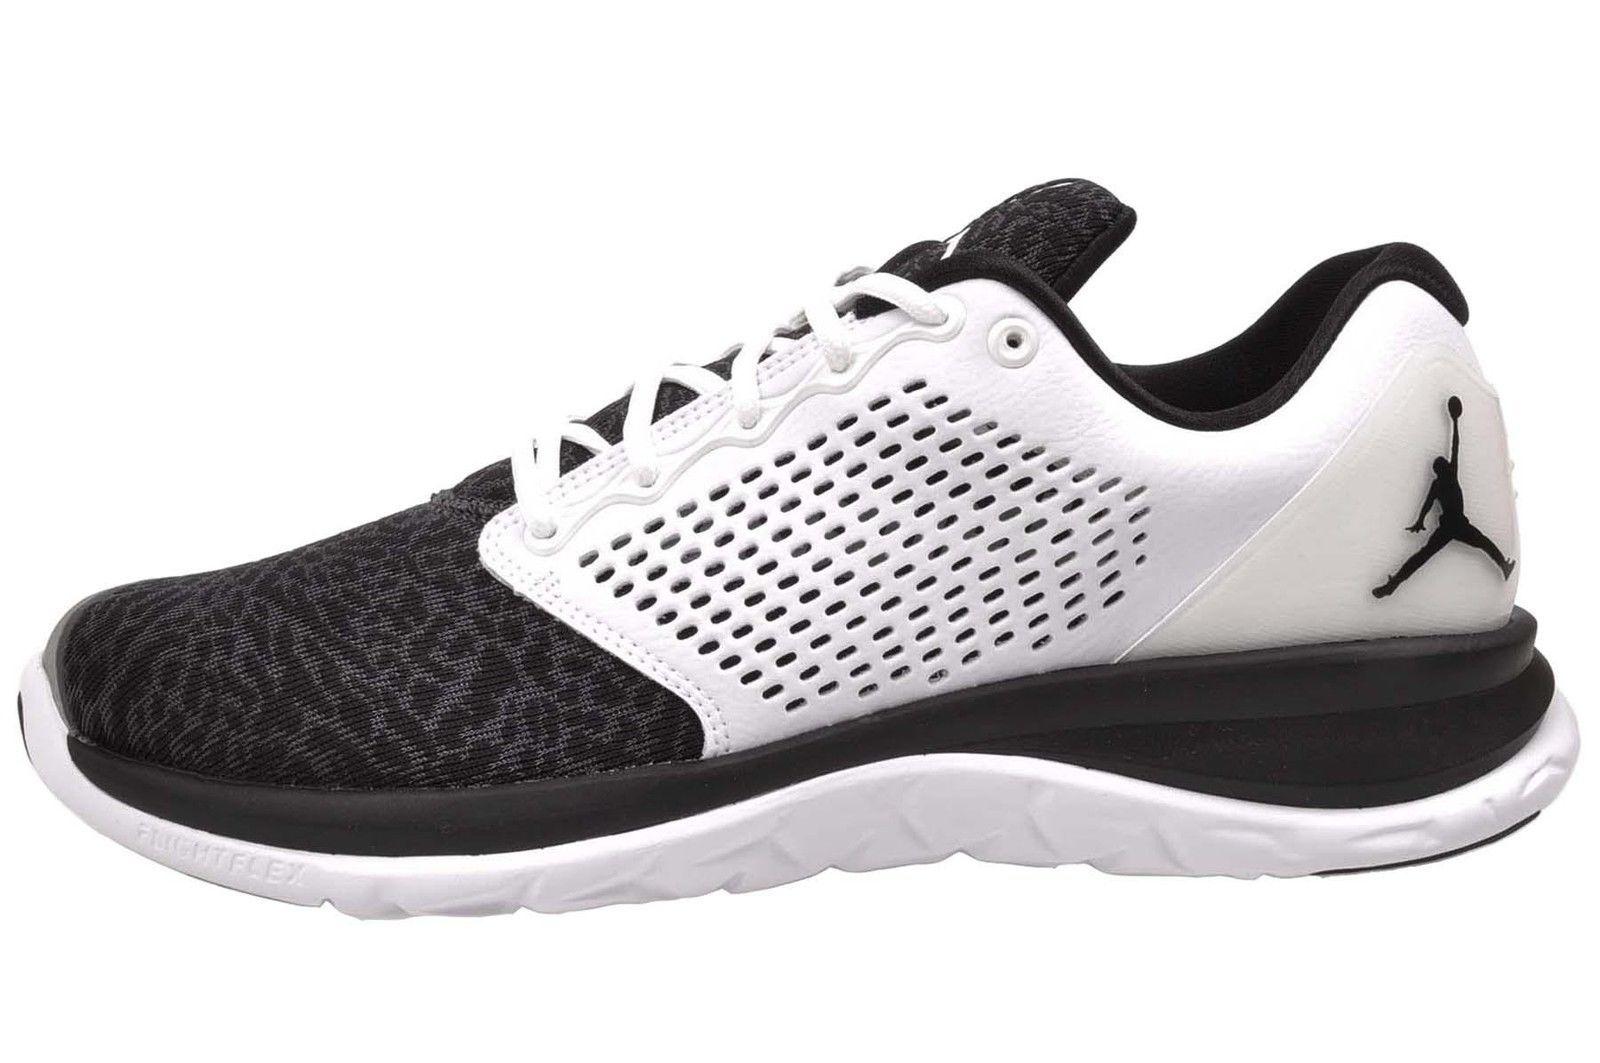 3c9269906f2 Nike Jordan Trainer ST Air Mens Shoes Black White 820253-110 ...